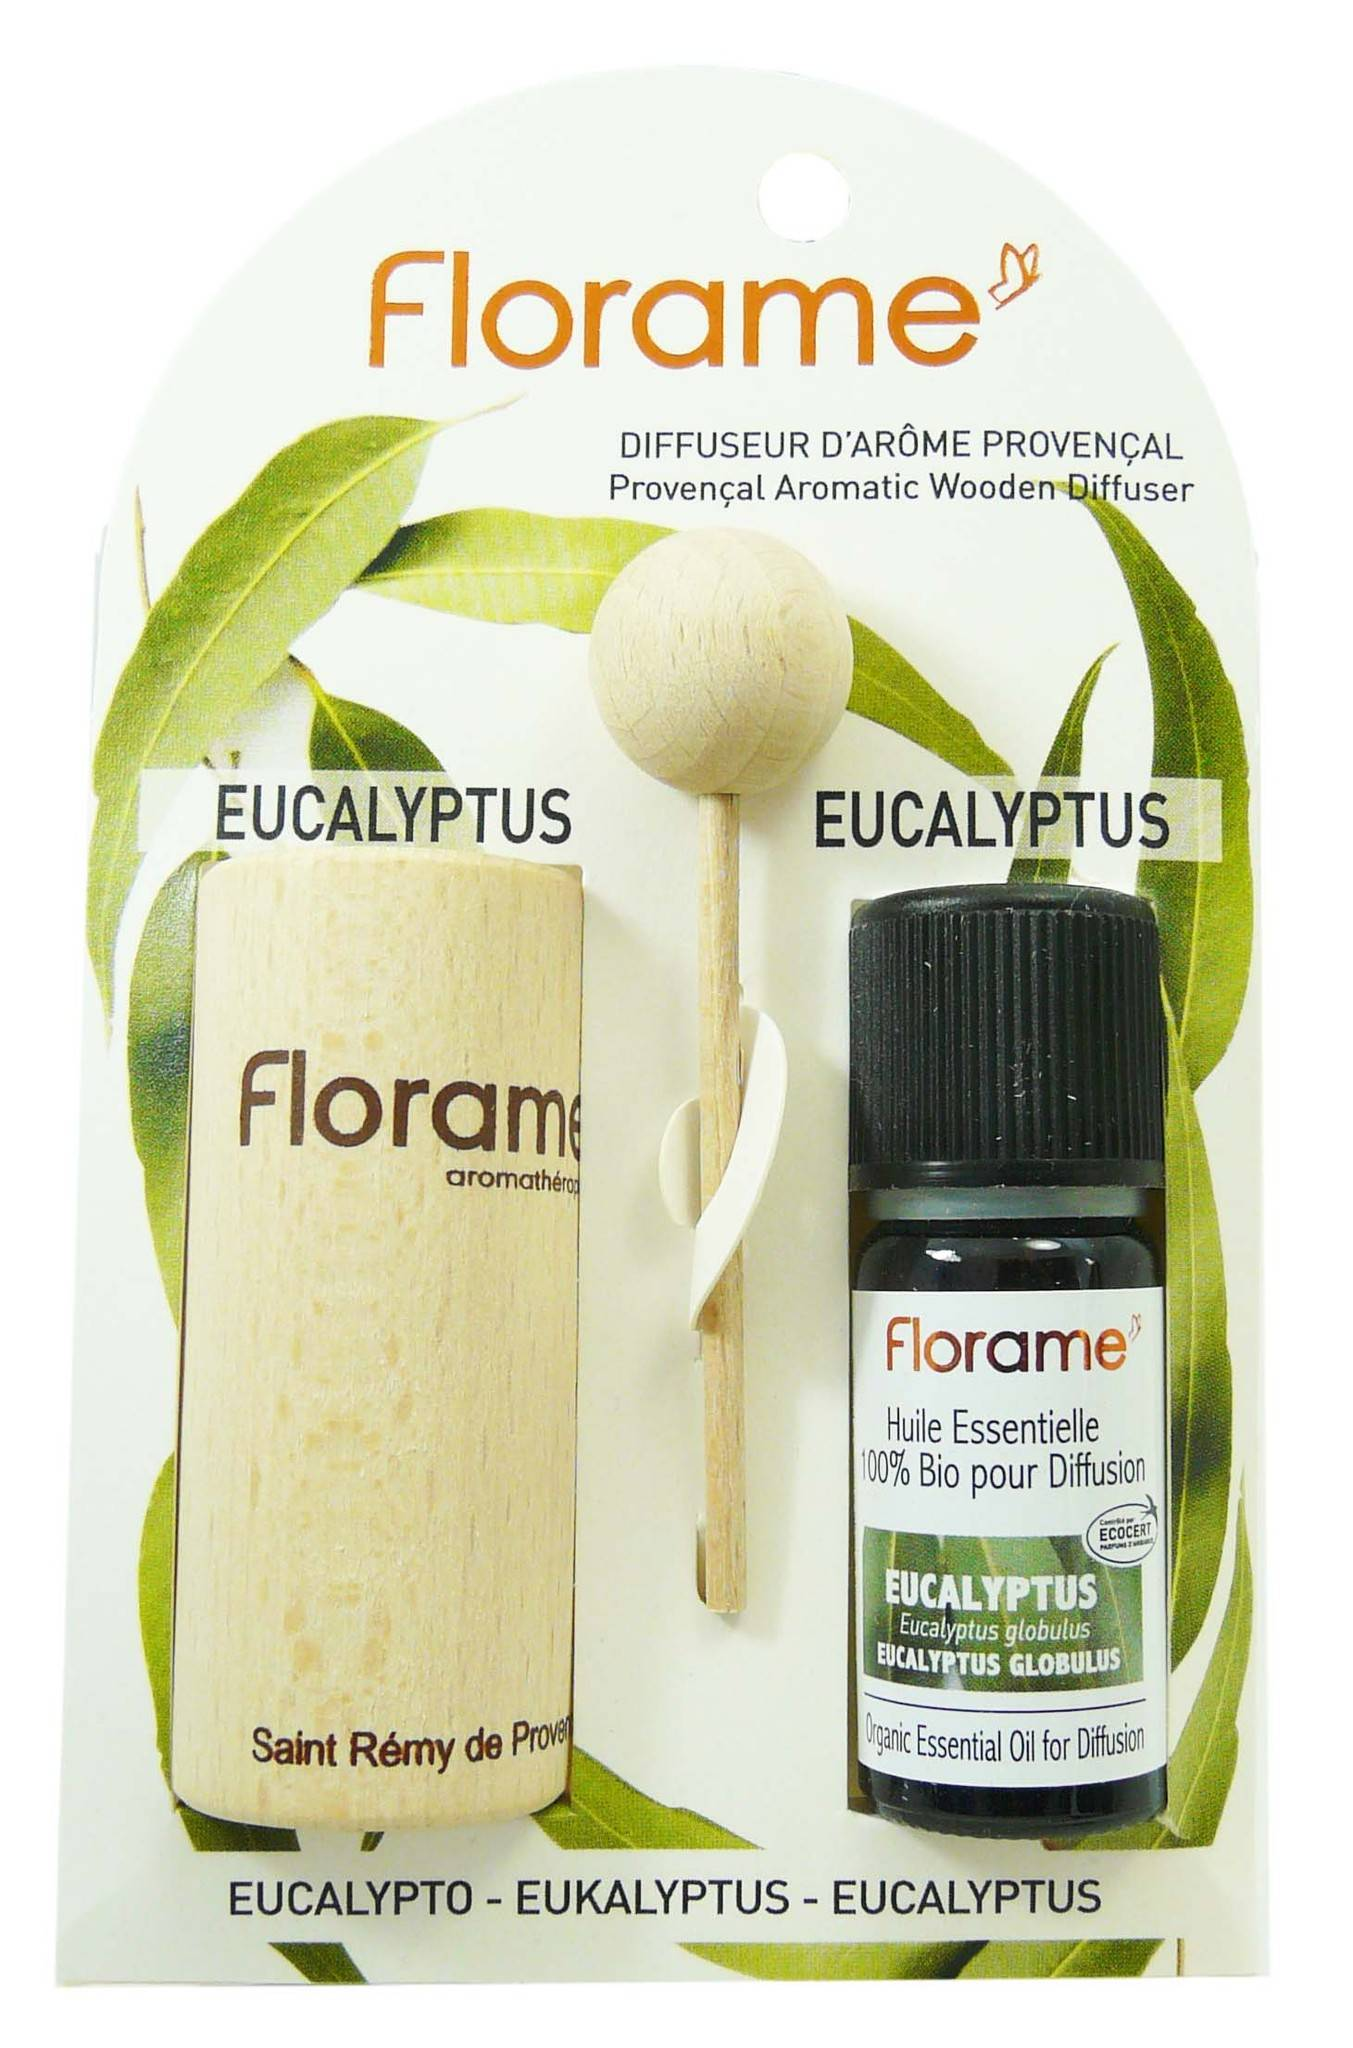 Florame diffuseur d'arome provencal eucalyptus